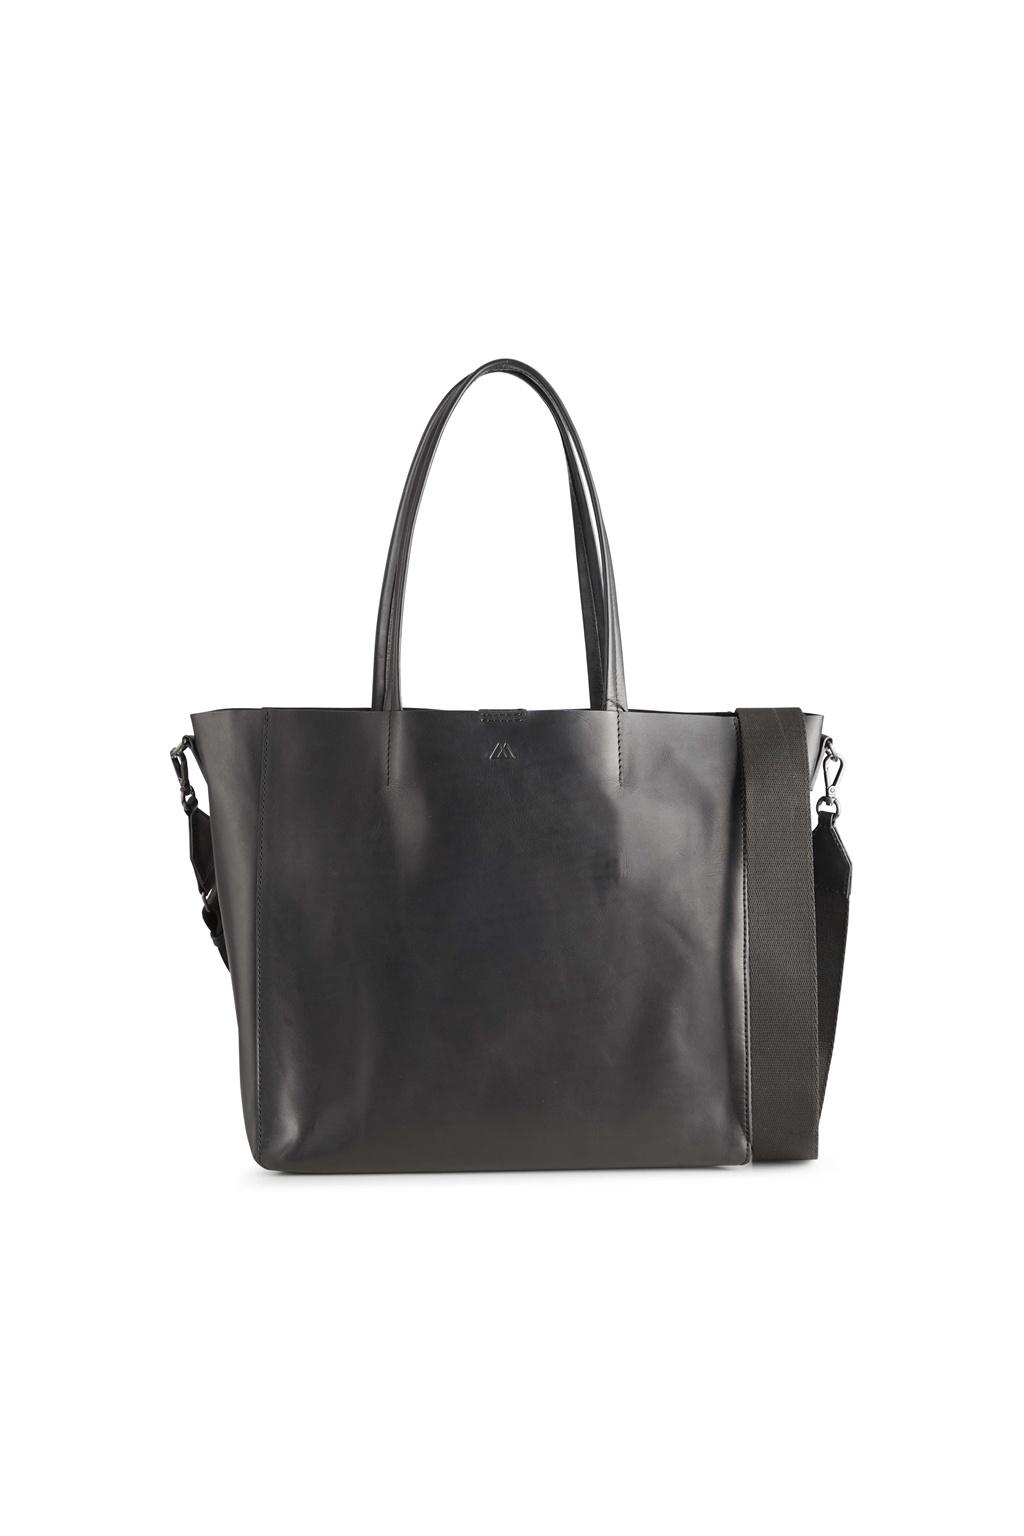 Reese Shopper Bag - Antique Black w/ Black-1